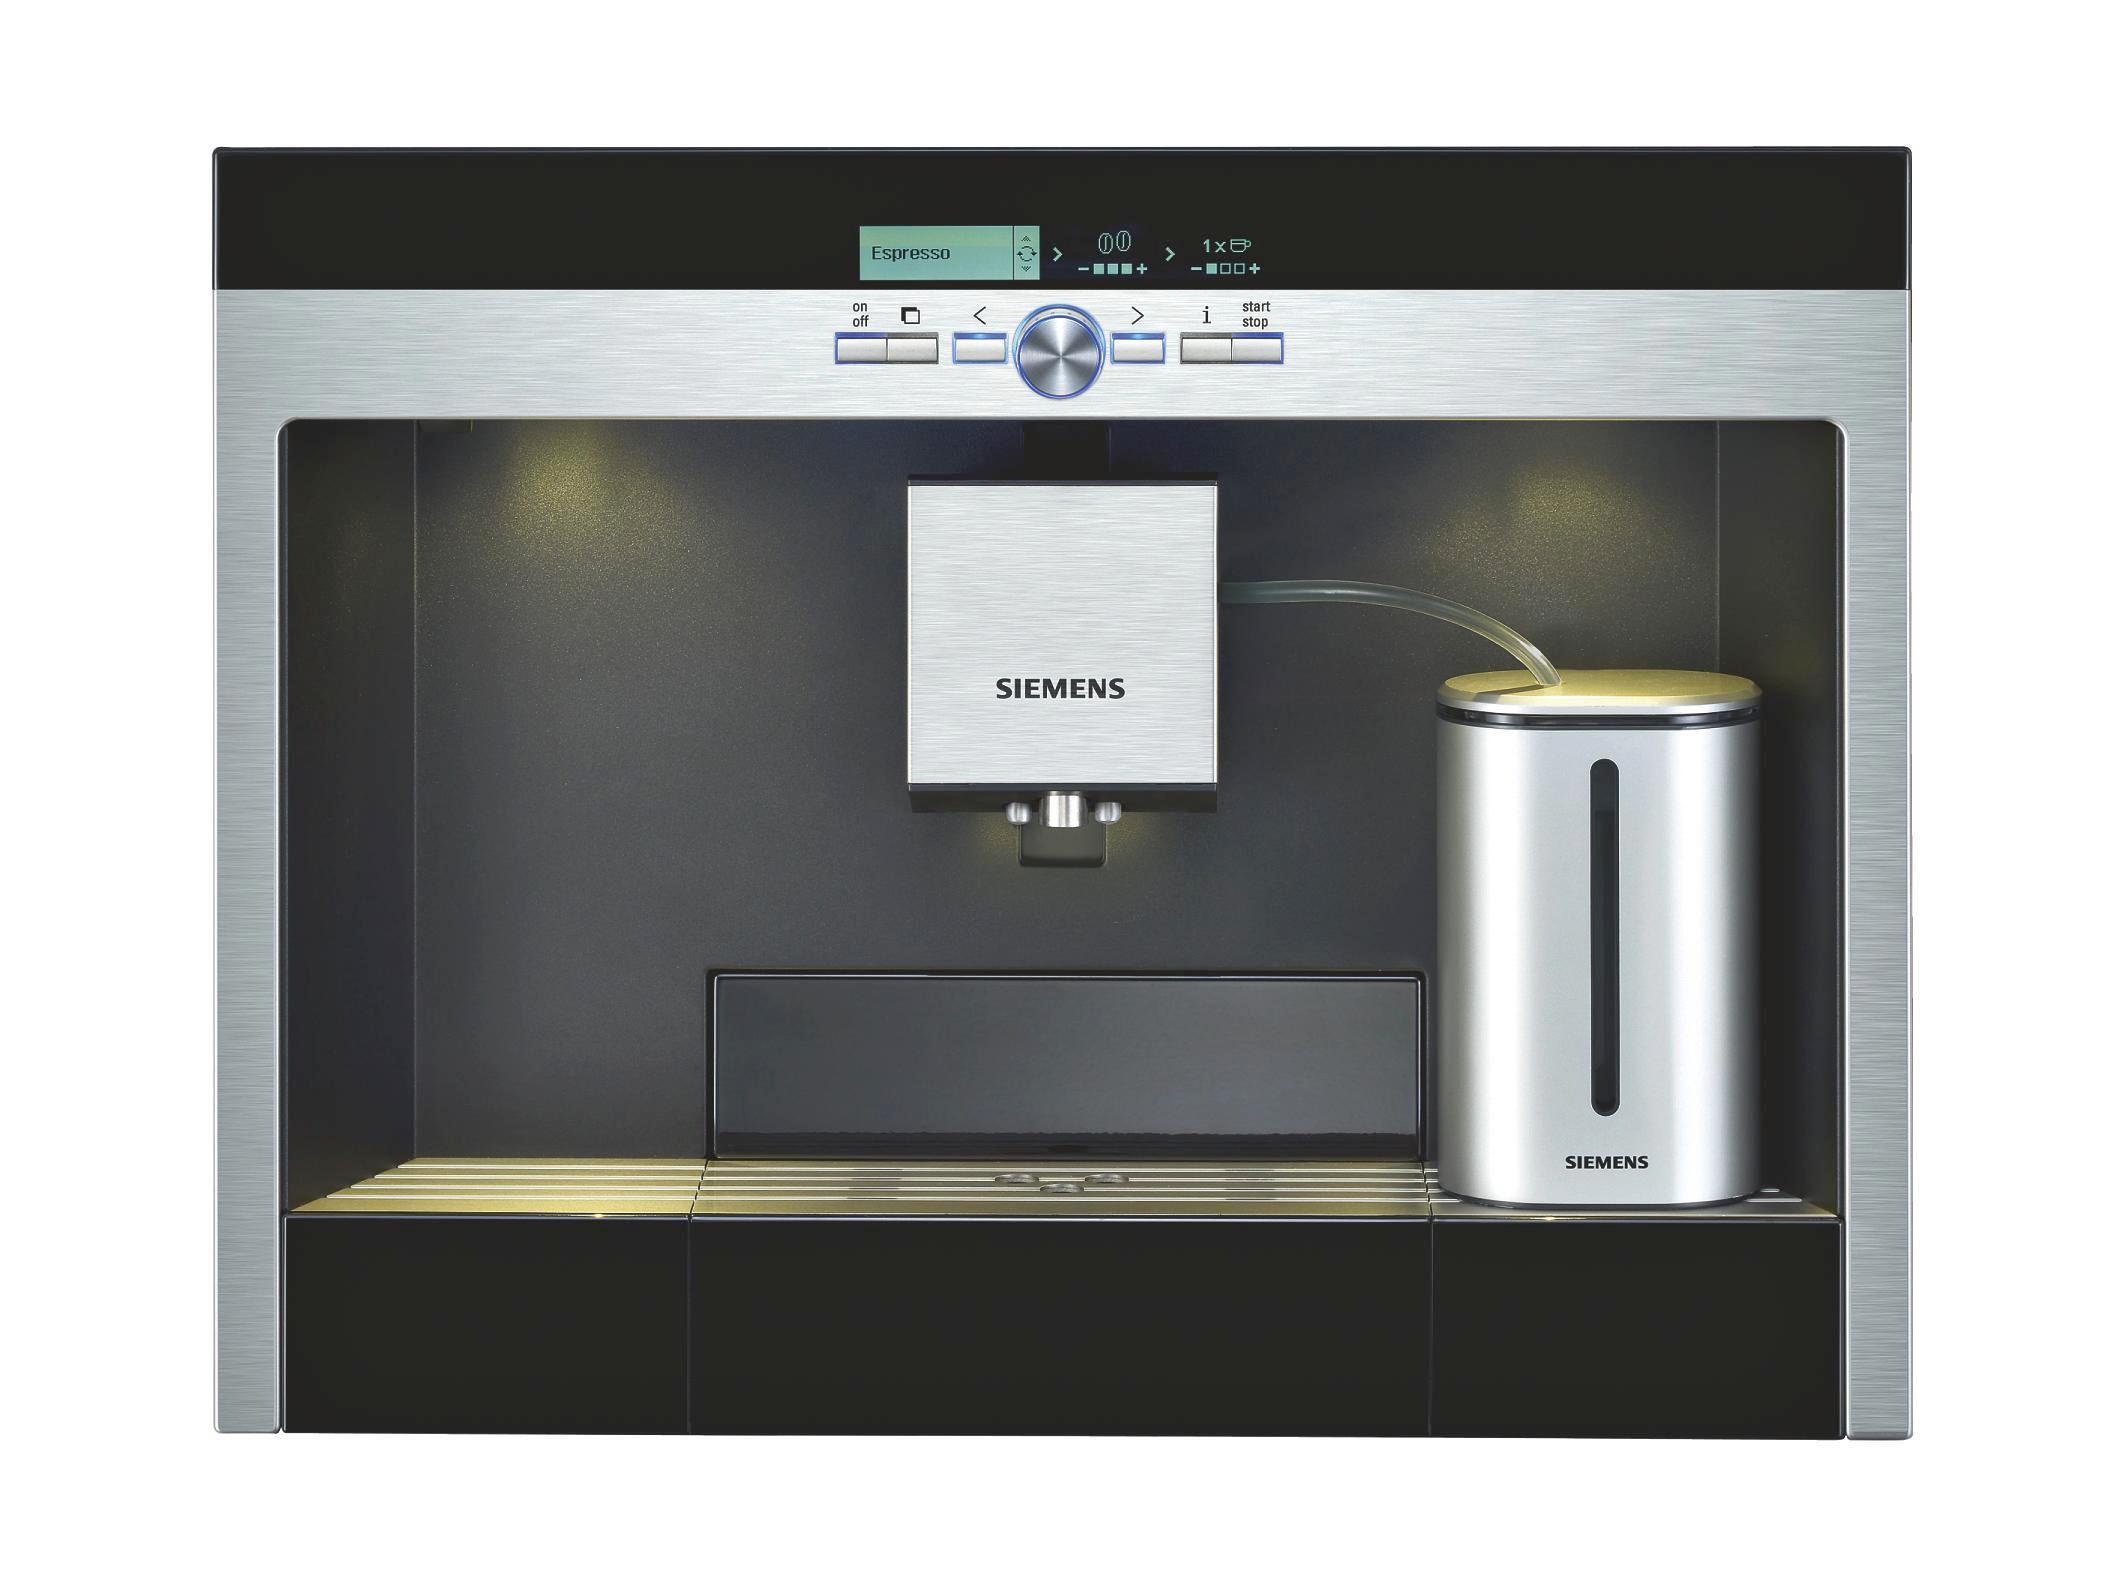 Kaffeevollautomat Siemens Tk76k573, 1700 Watt - ROMANTIK / LANDHAUS, Metall (59,5/45,4/53,5cm) - SIEMENS